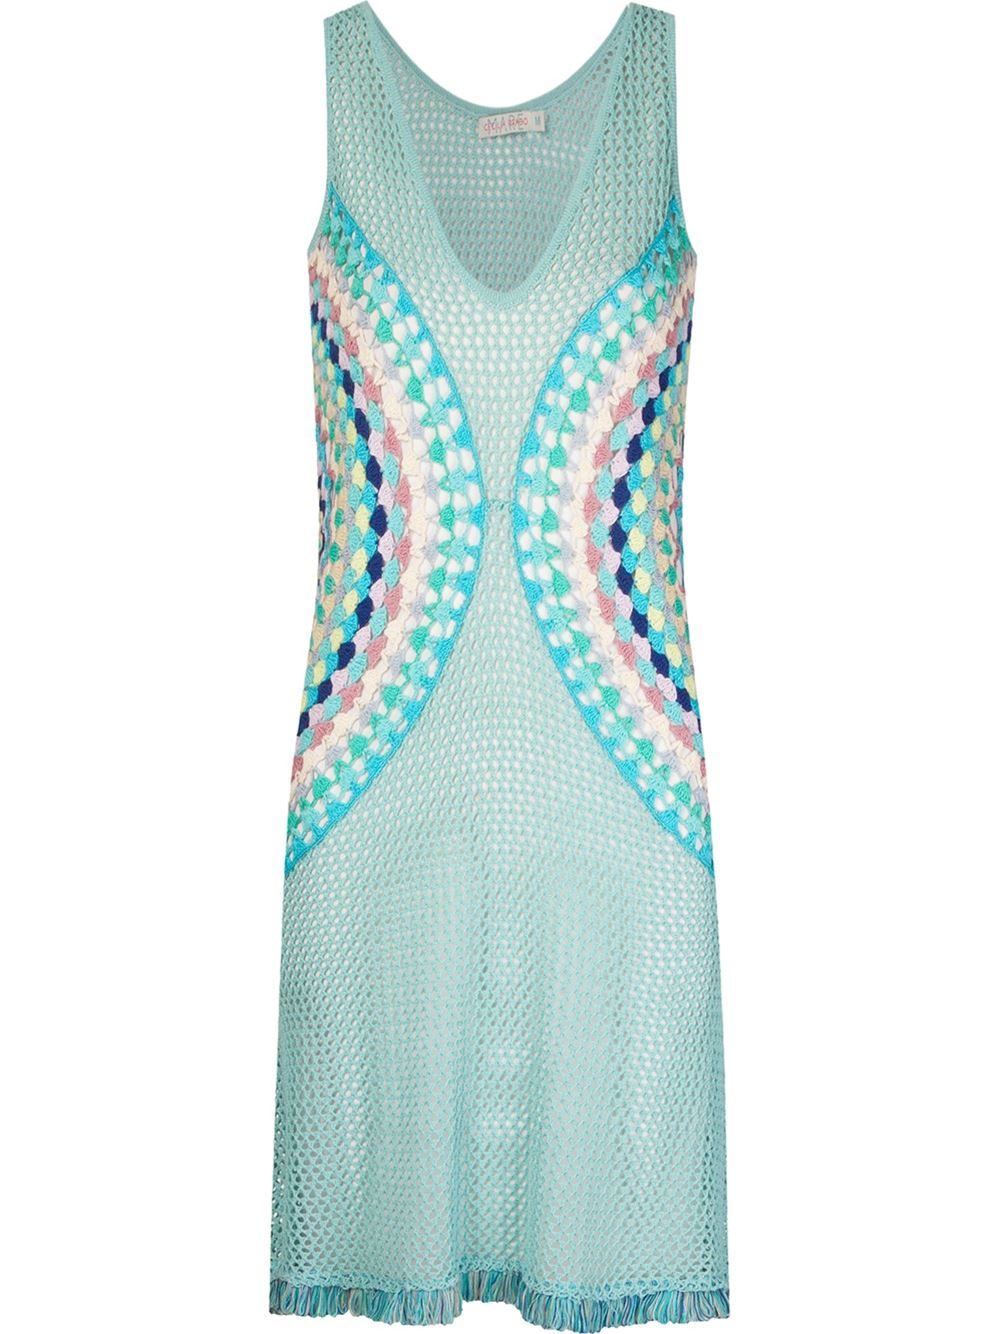 Vestido Cecilia Prado R$610,20- aqui